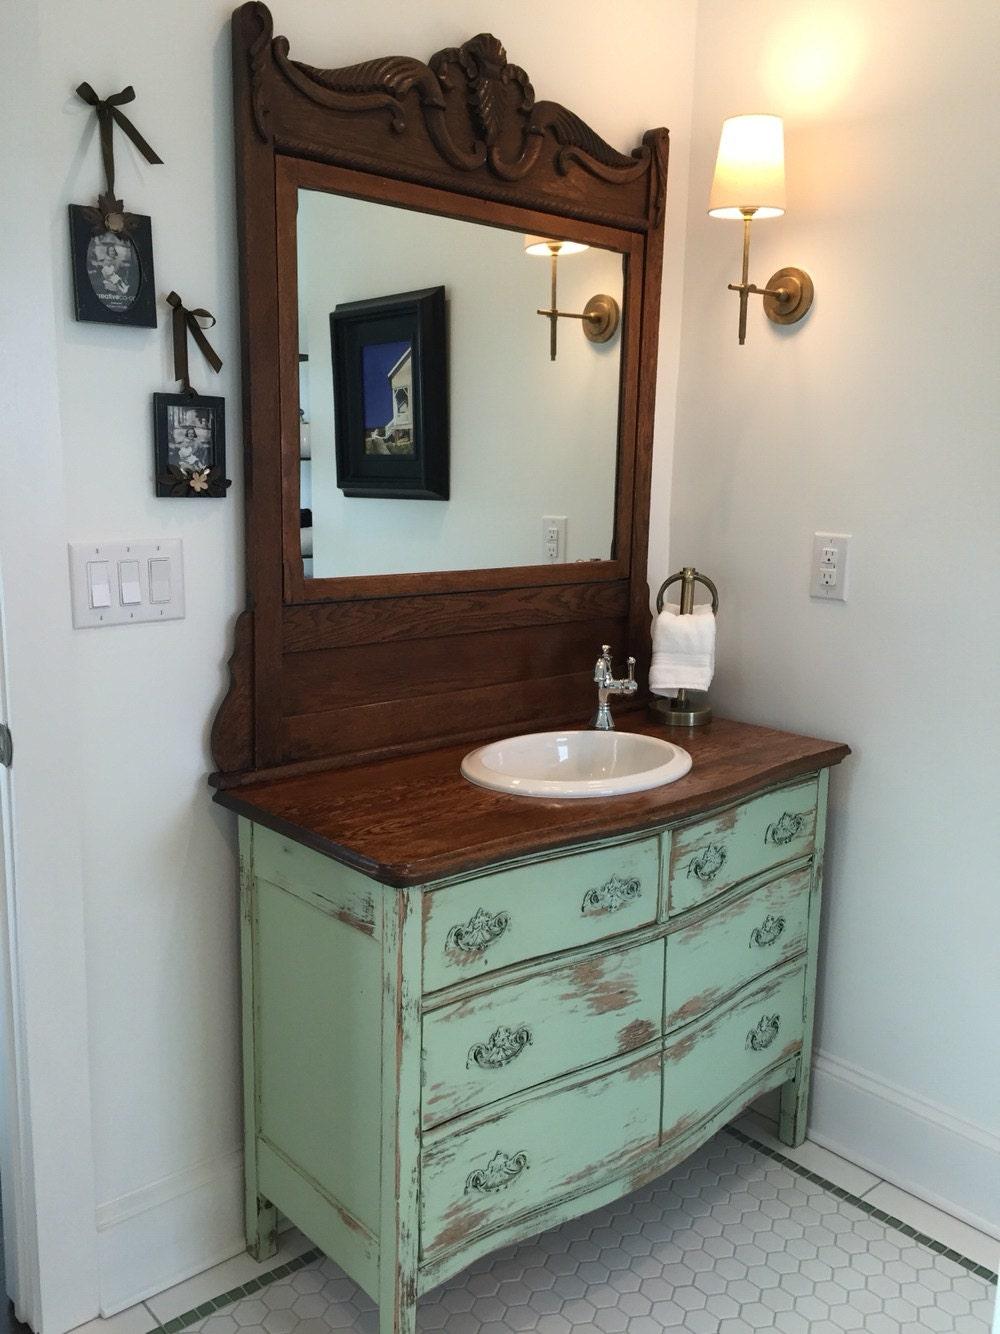 🔎zoom - BATHROOM VANITY From Antique Dresser We Find Restore